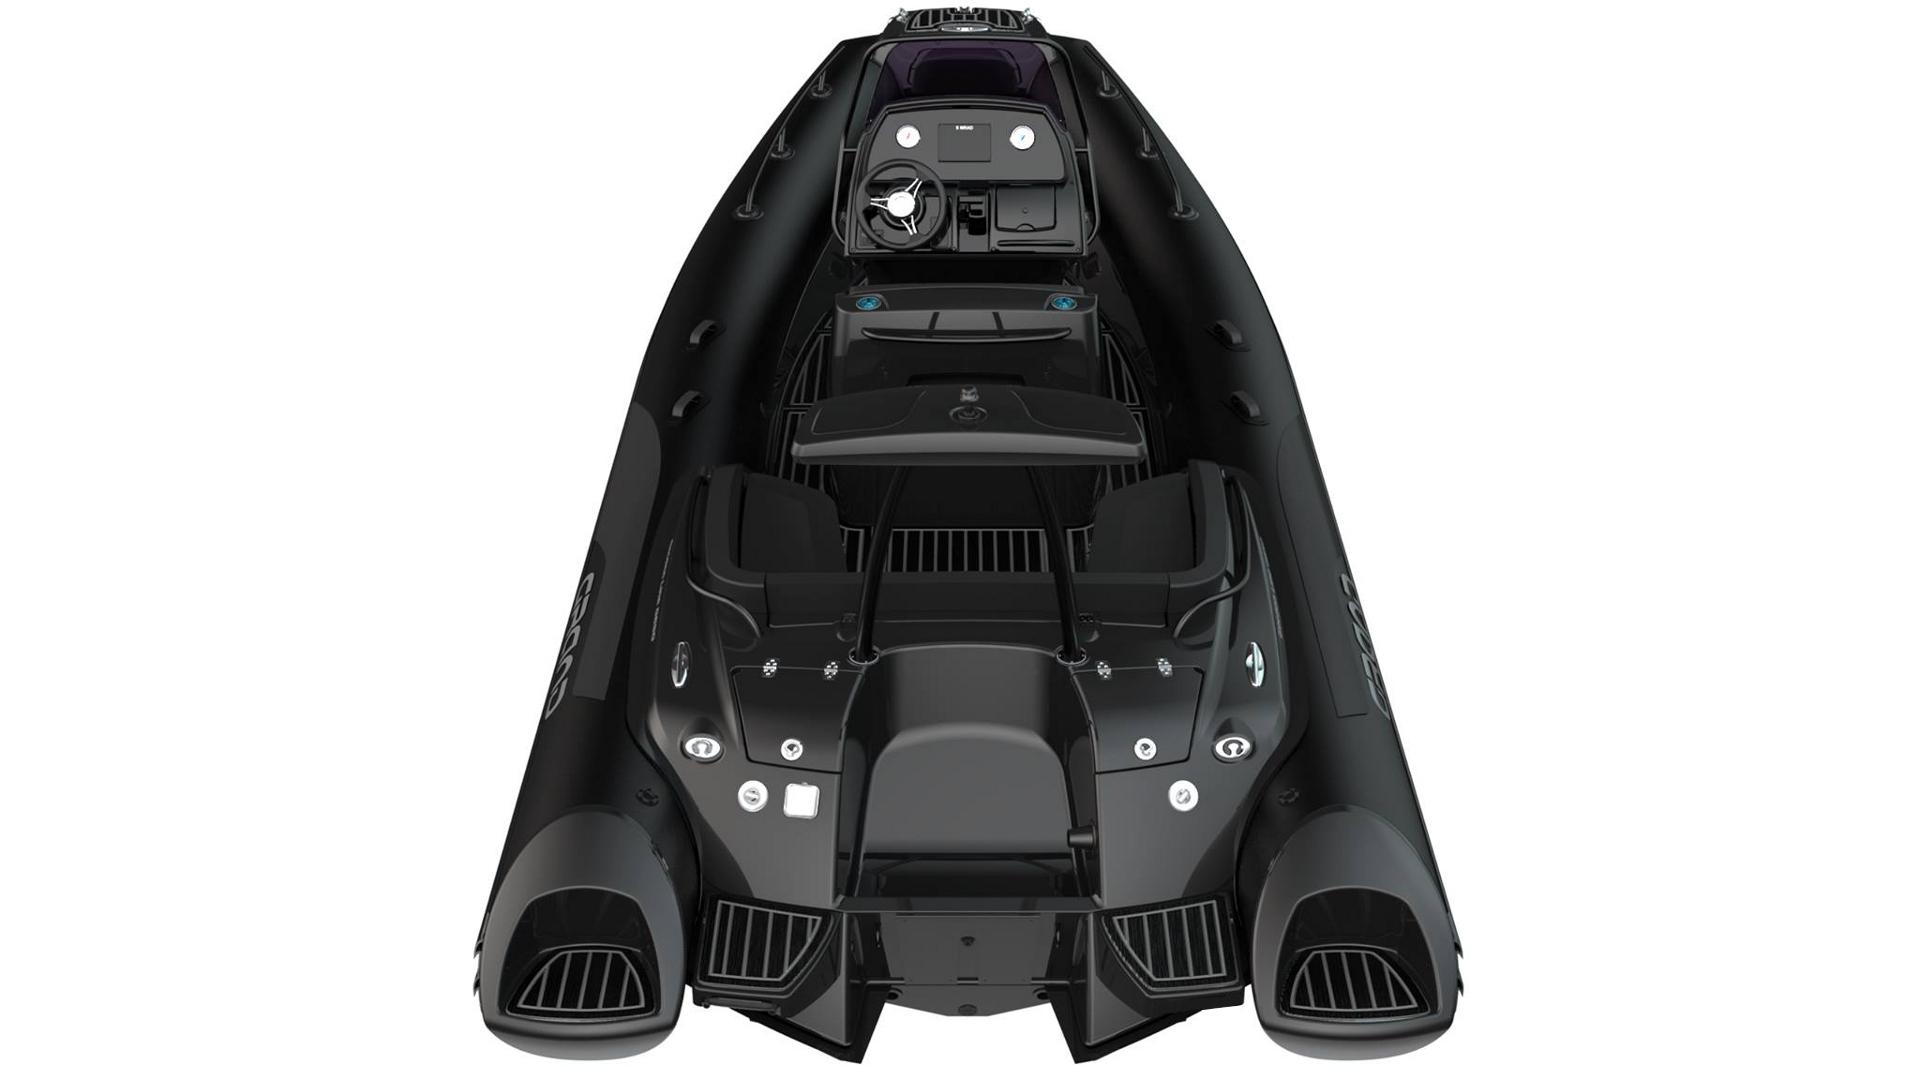 Grand Golden Line G650LF, Grand Golden Line G650, Golden Line G650, GRAND G650, G650, Надувная лодка GRAND Golden Line G650, Надувная лодка GRAND G650, Надувная лодка с жестким дном, Rigid Inflatable Boats, RIB